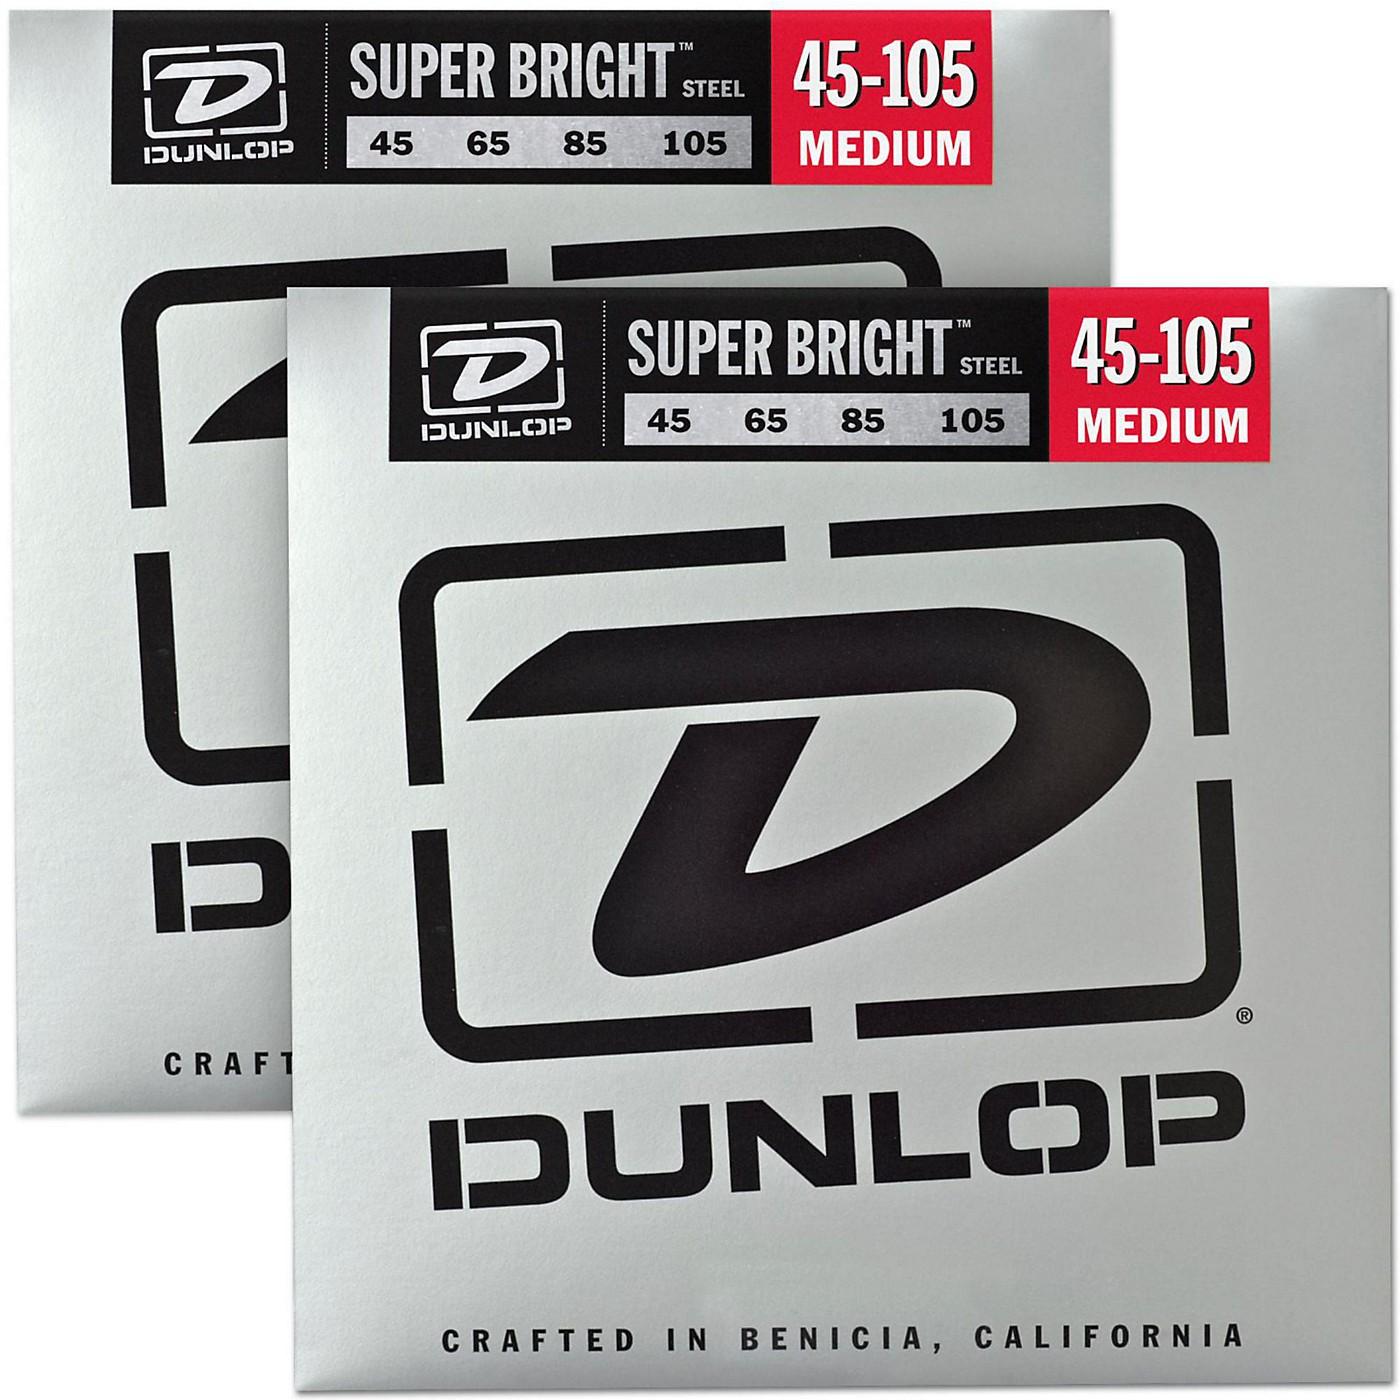 Dunlop Super Bright Steel Medium 4-String Bass Guitar Strings (45-105) 2-Pack thumbnail